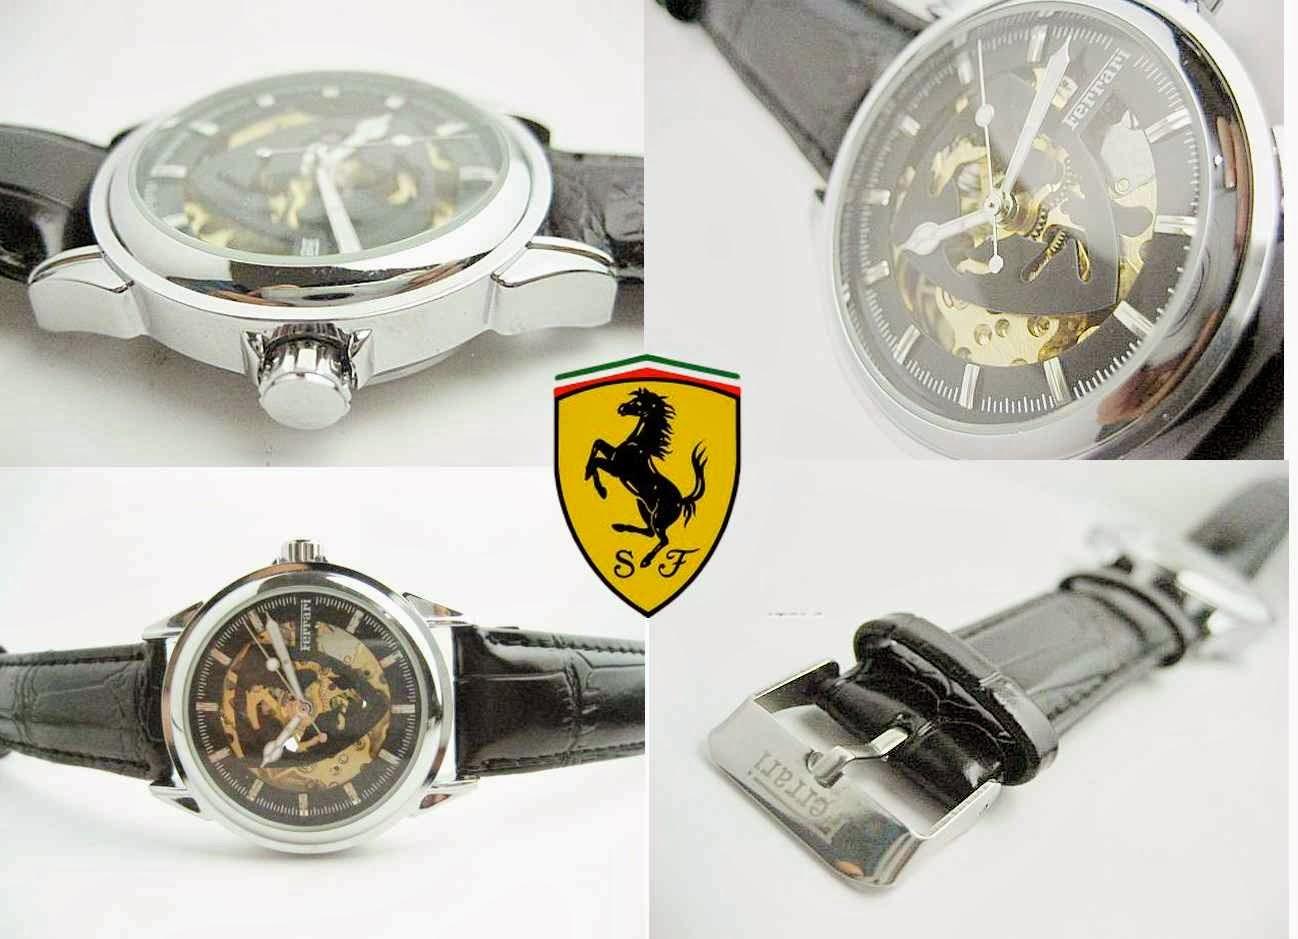 Jam Tangan Ferrari Skeleton - Guns Kulit warna hitam